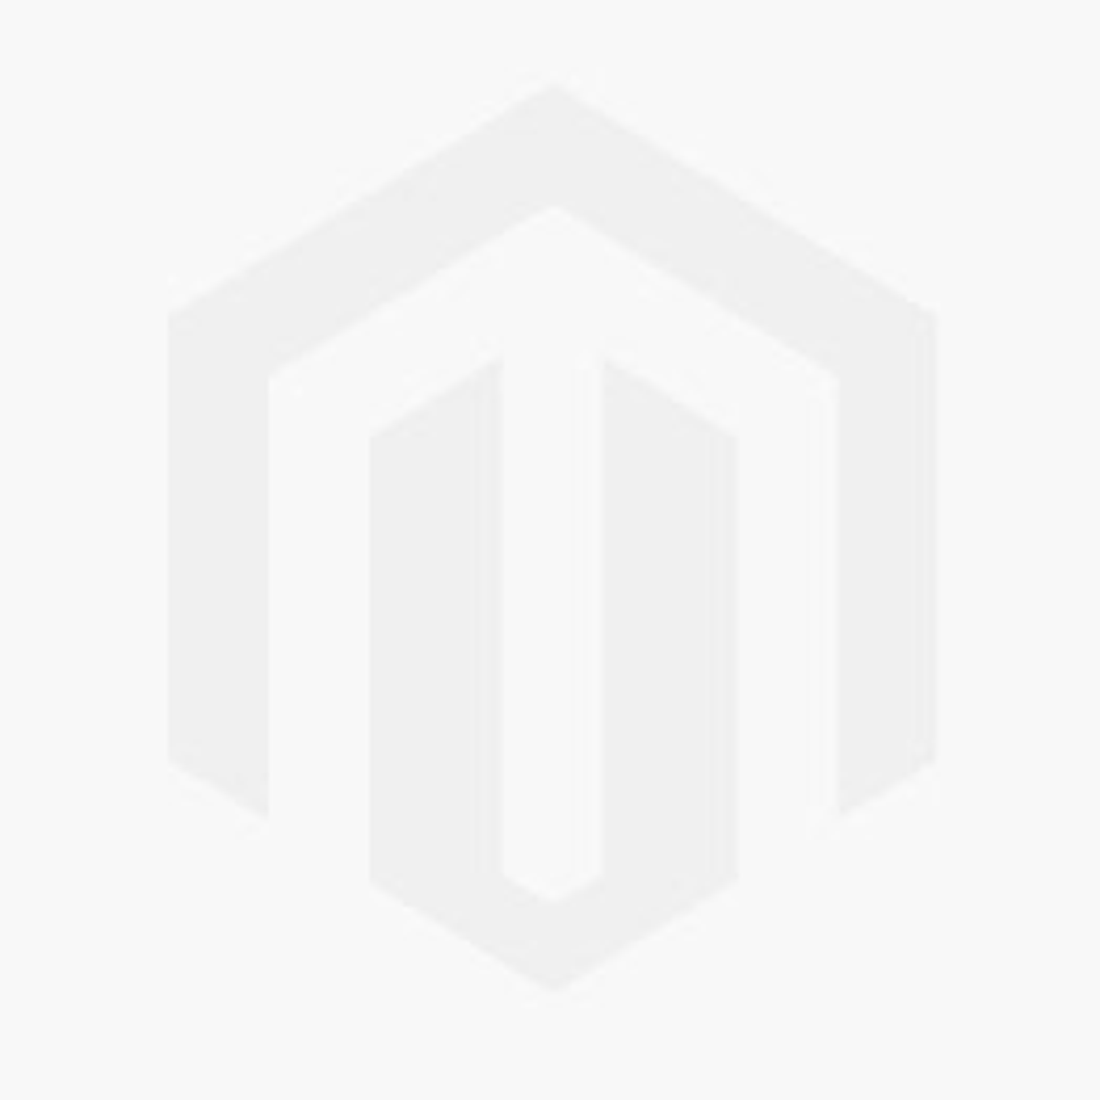 Phyllida Barlow cul-de-sac Softback Exhibition Catalogue